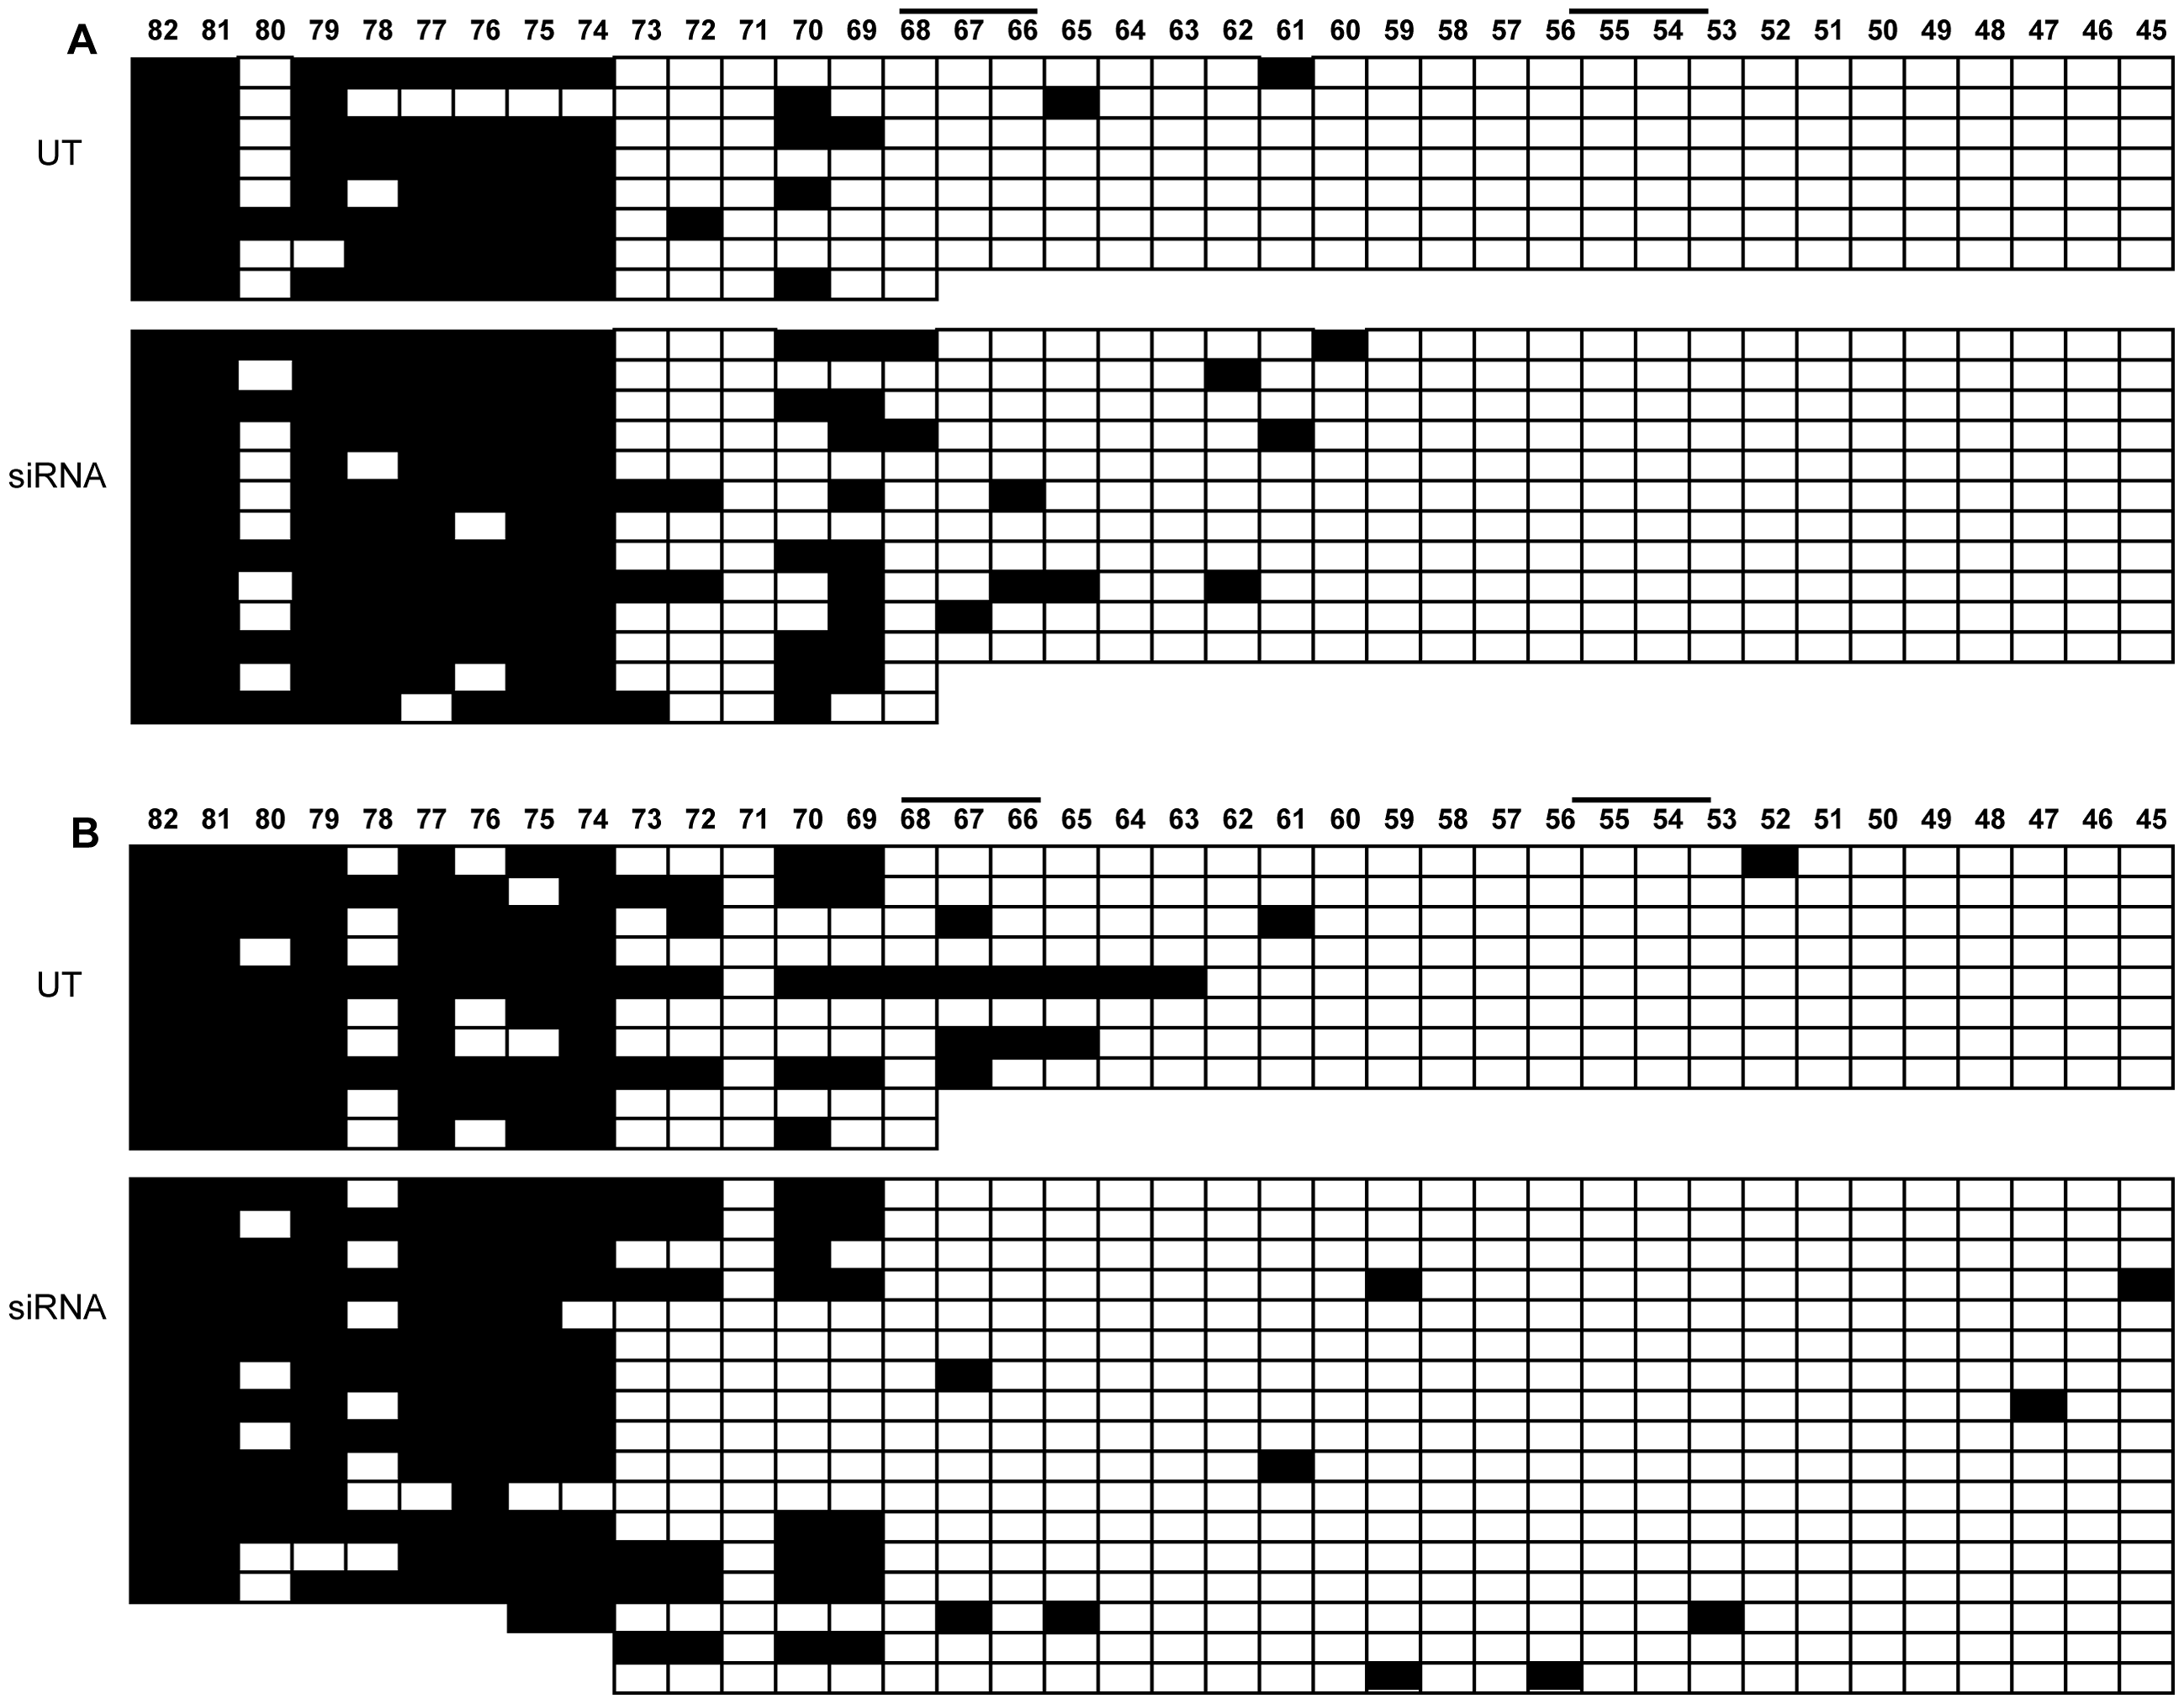 Methylation analysis of <i>FMR1</i> locus after <i>CTCF</i> knock-down.